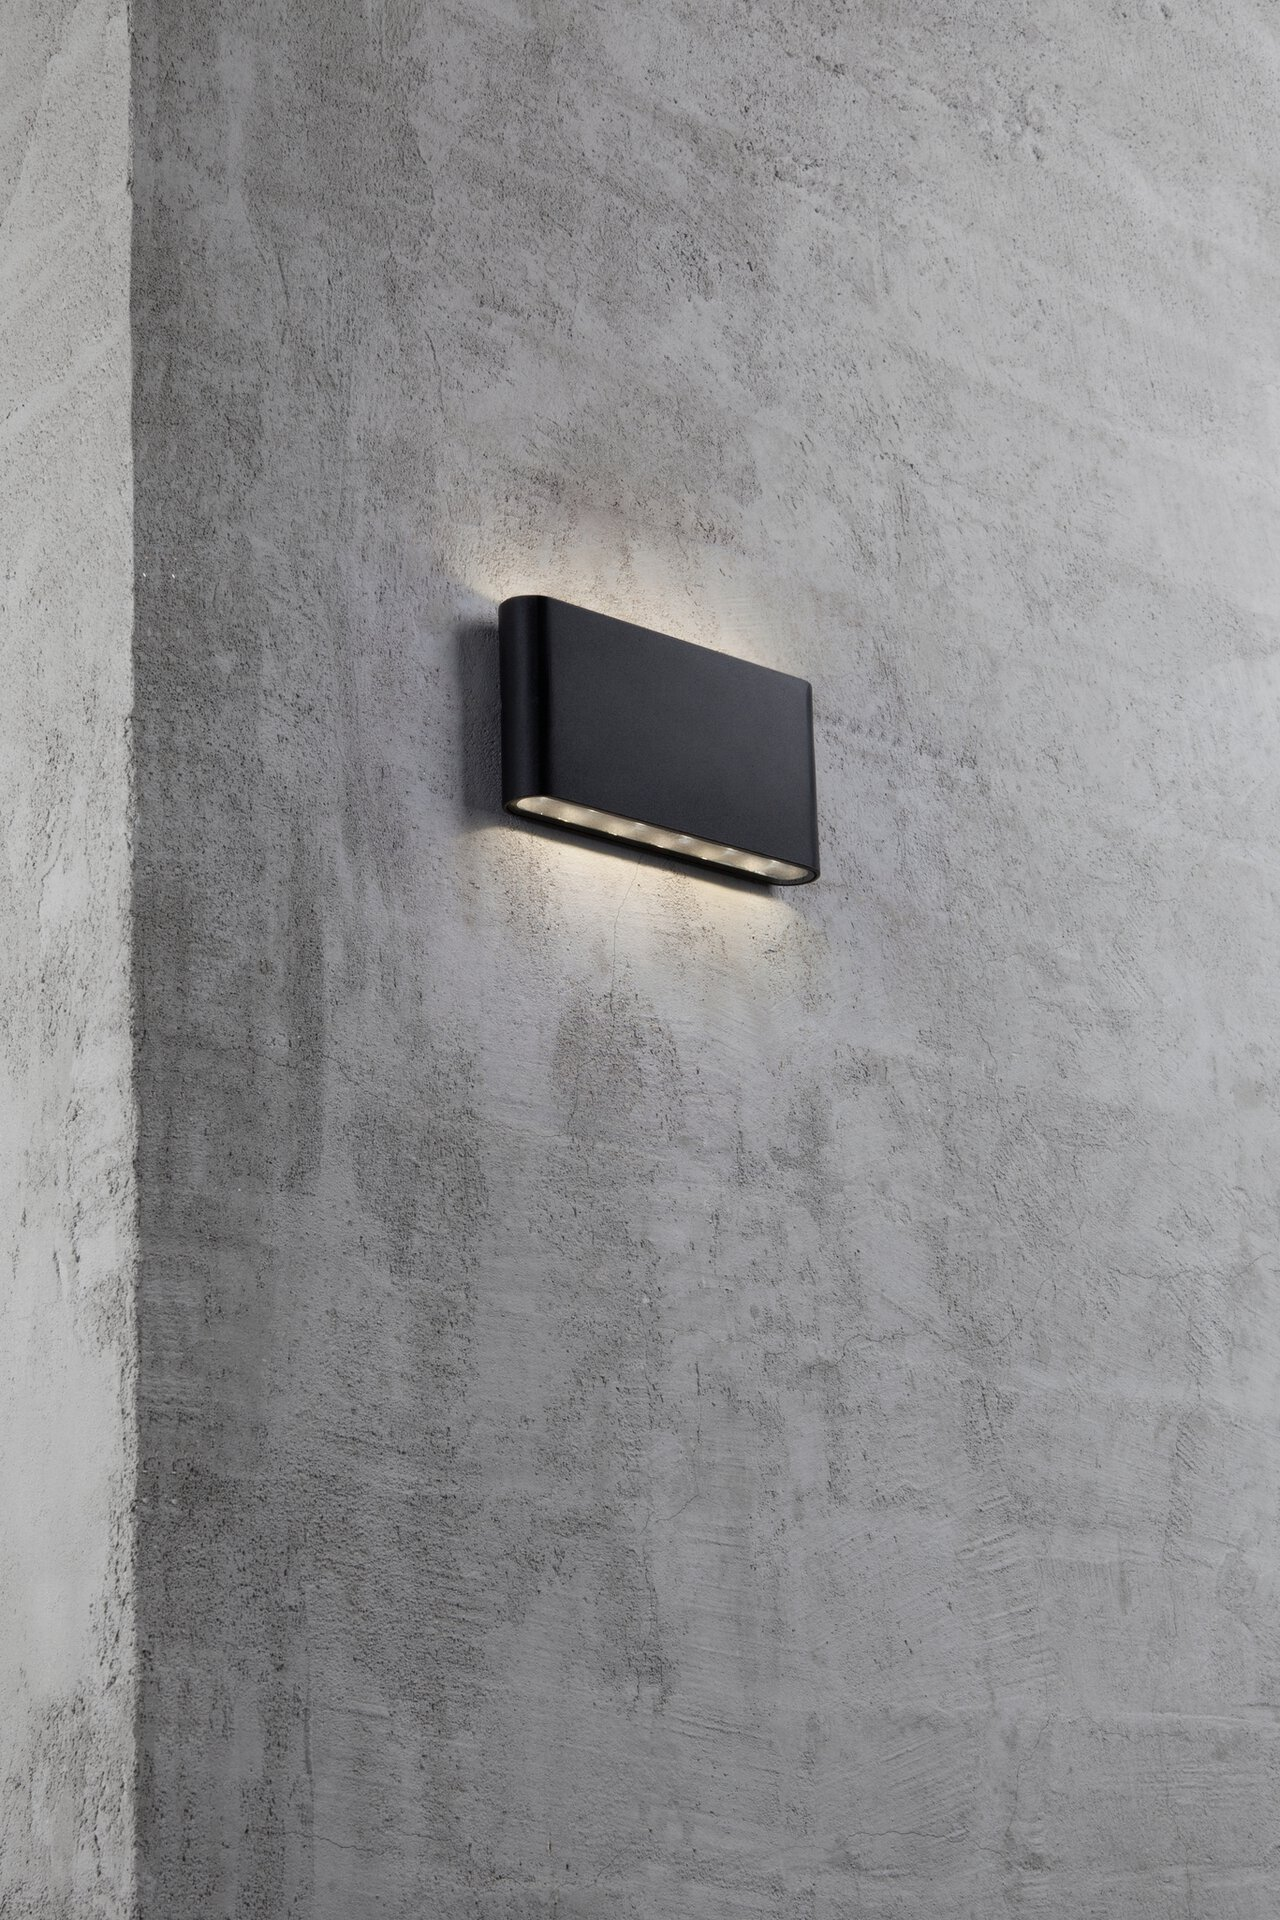 Wand-Aussenleuchte KINVER Nordlux Metall 3 x 9 x 17 cm